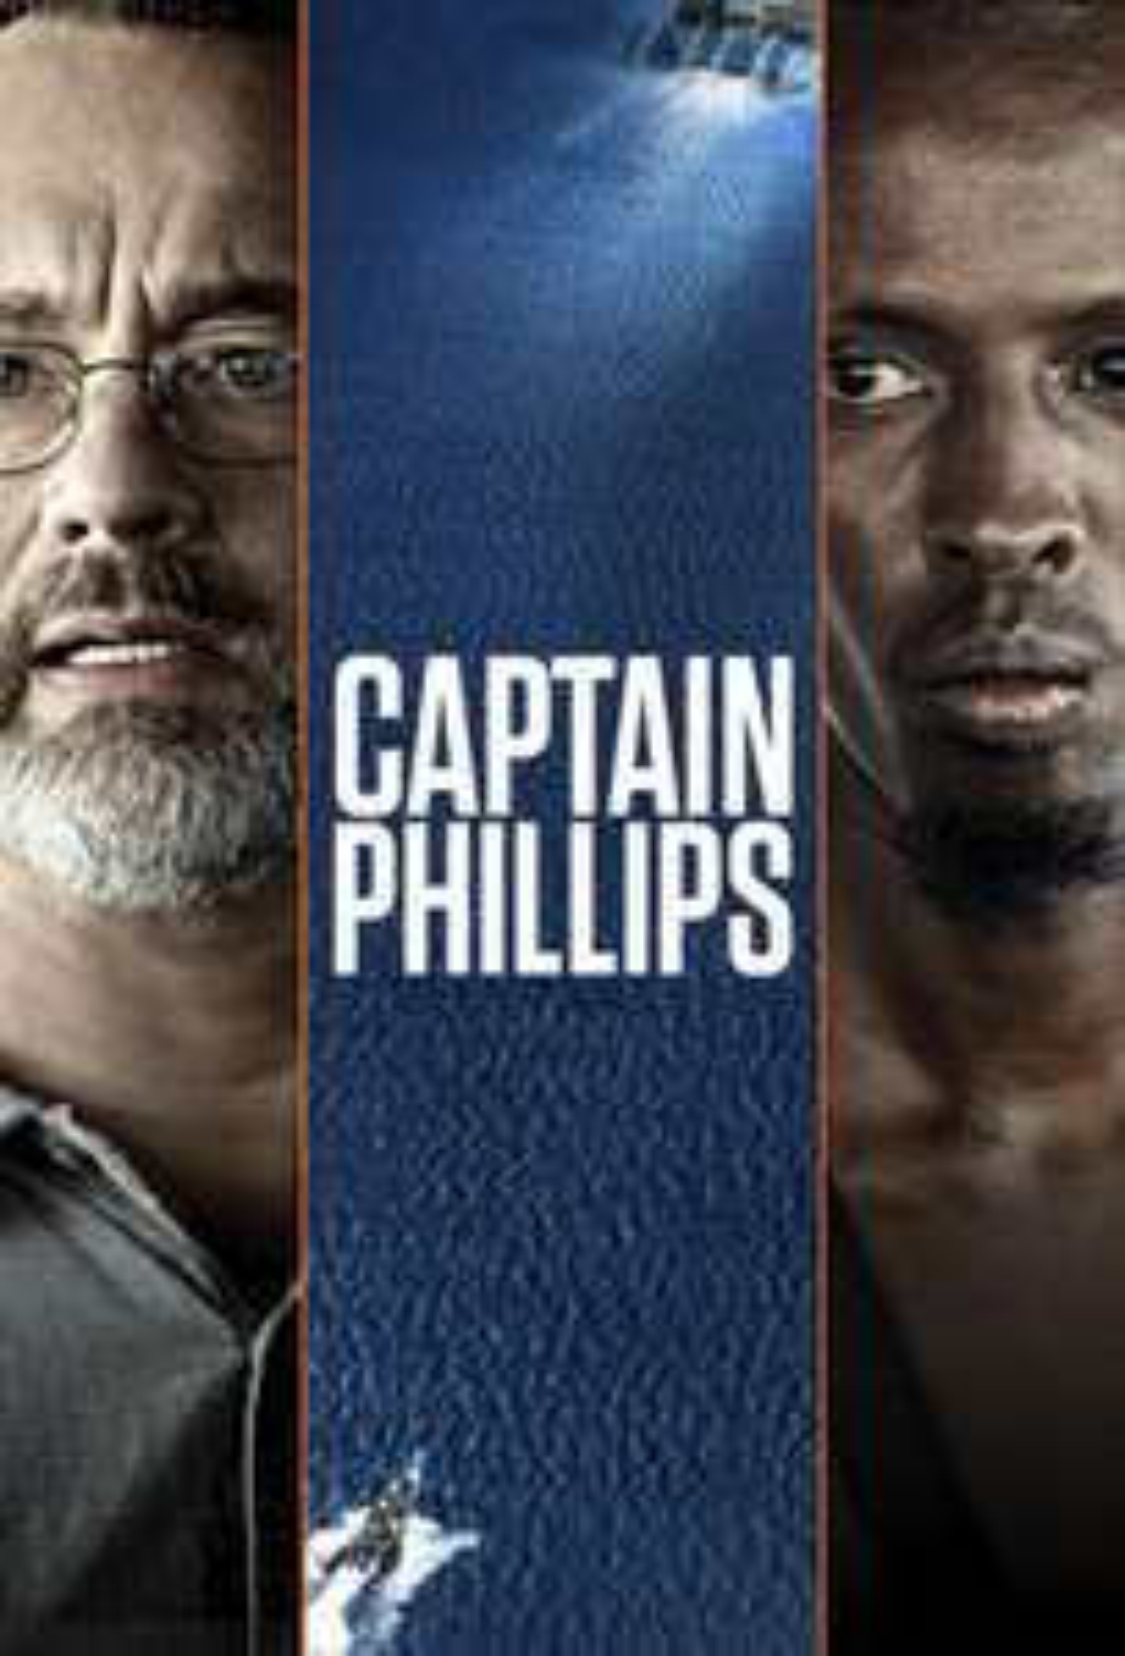 Captain Phillips iTunes 4K £3.99